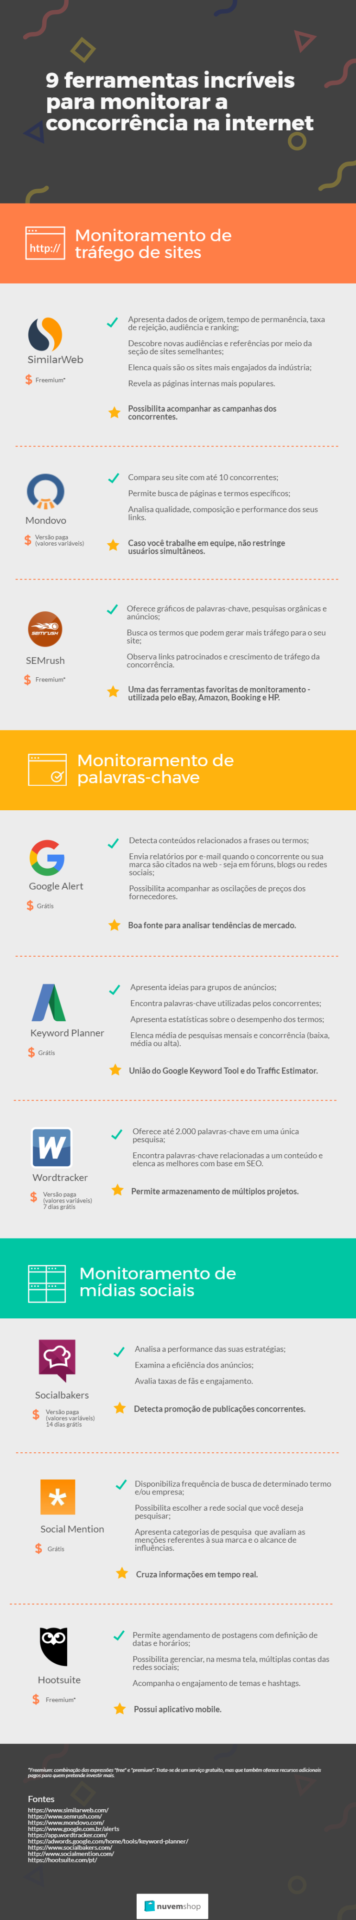 9 ferramentas incríveis para monitorar a concorrência na internet